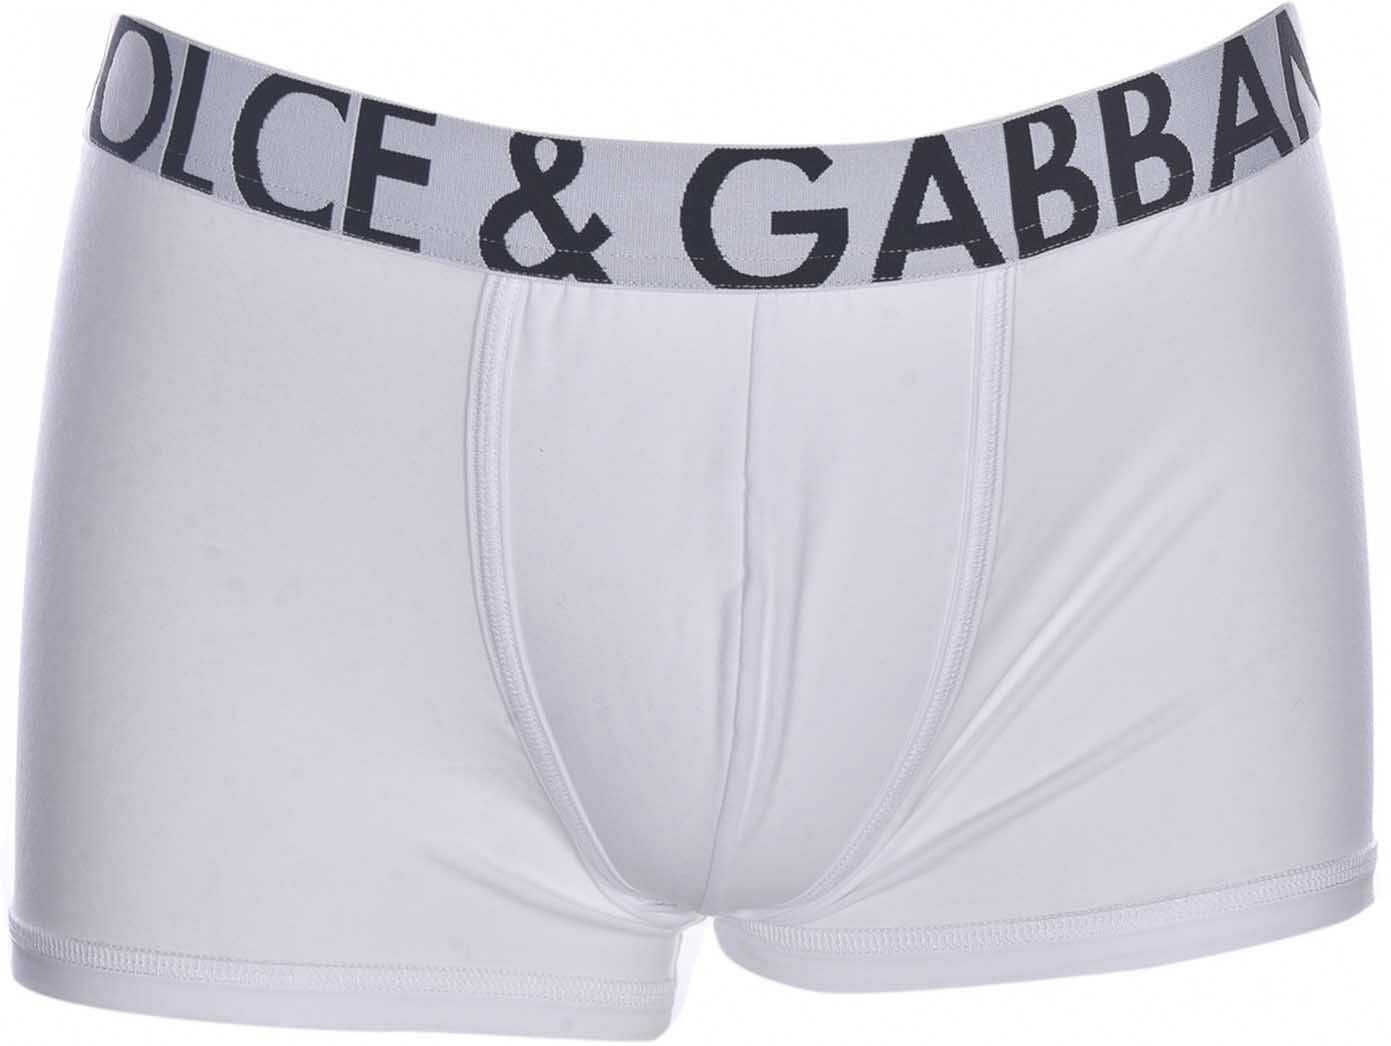 Dolce & Gabbana Logo Band Boxer Underwear In White White imagine